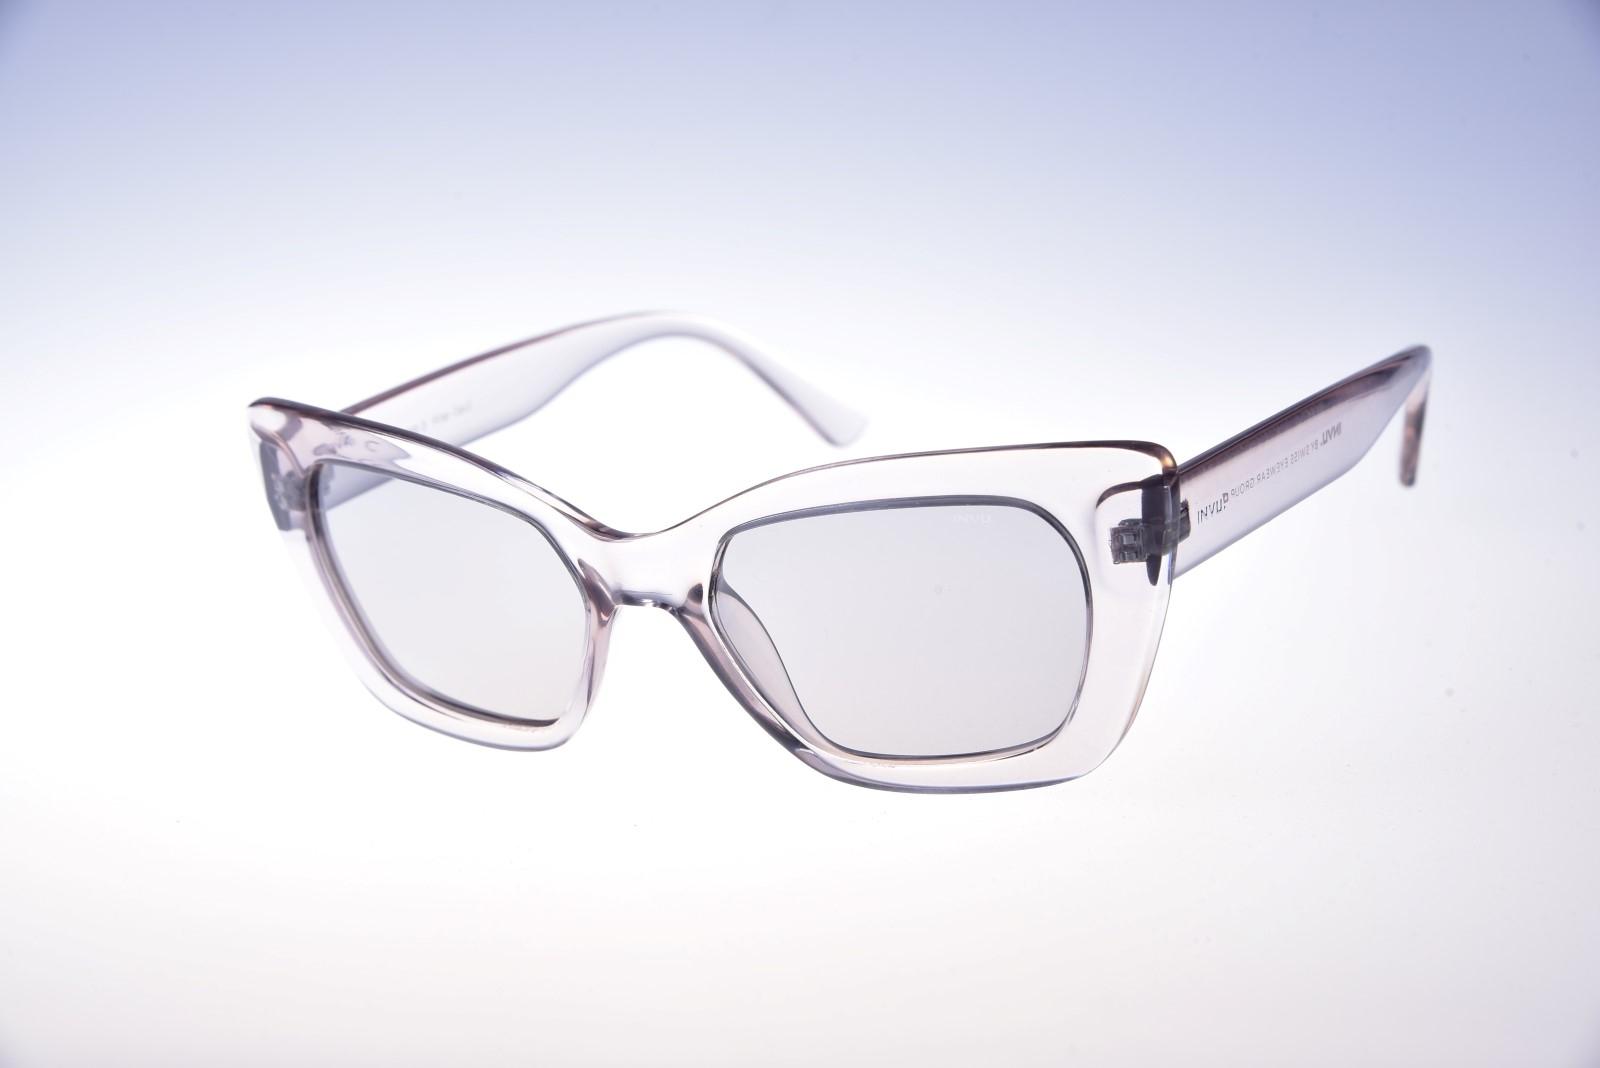 ad489b0d1 INVU. Trend T2900D - Dámske, pánske a detské slnečné okuliare ...